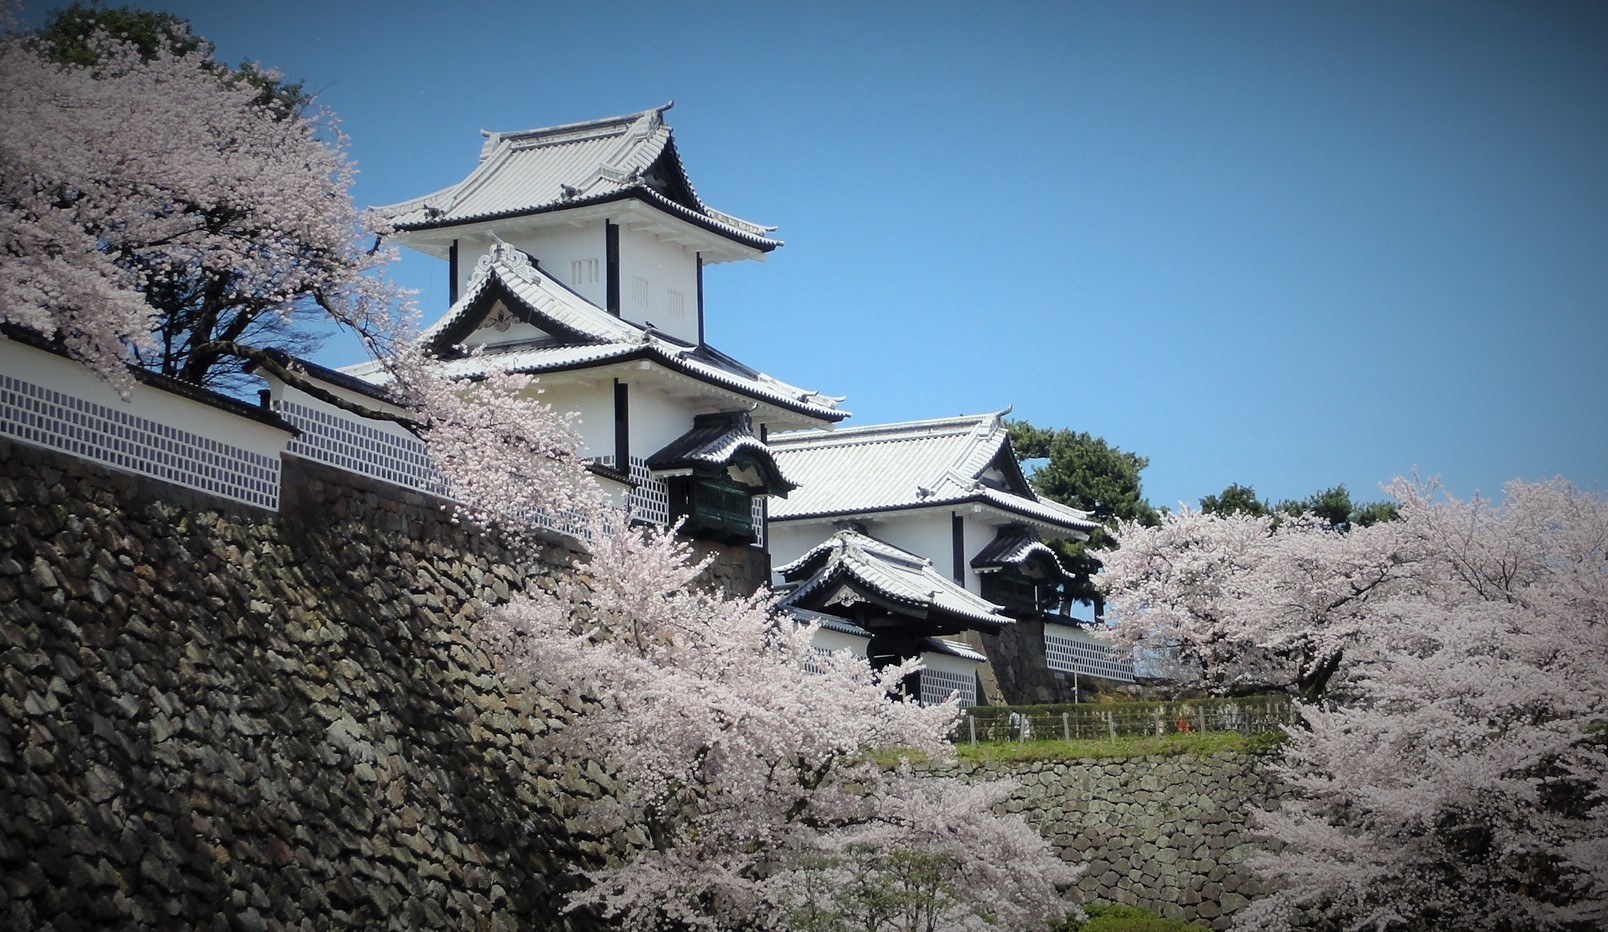 Kanazawa castle town in Japan